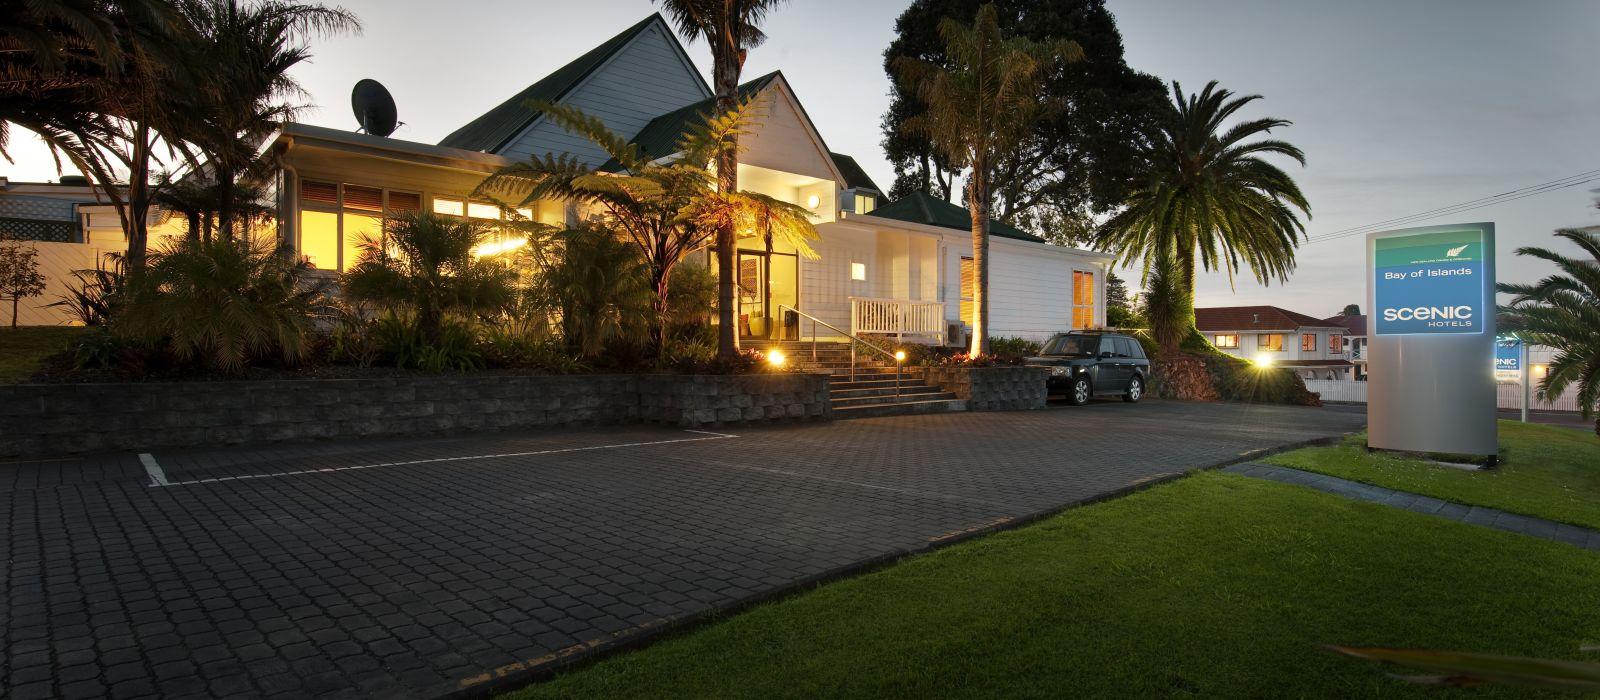 Hotel Scenic Bay Of Islands Neuseeland